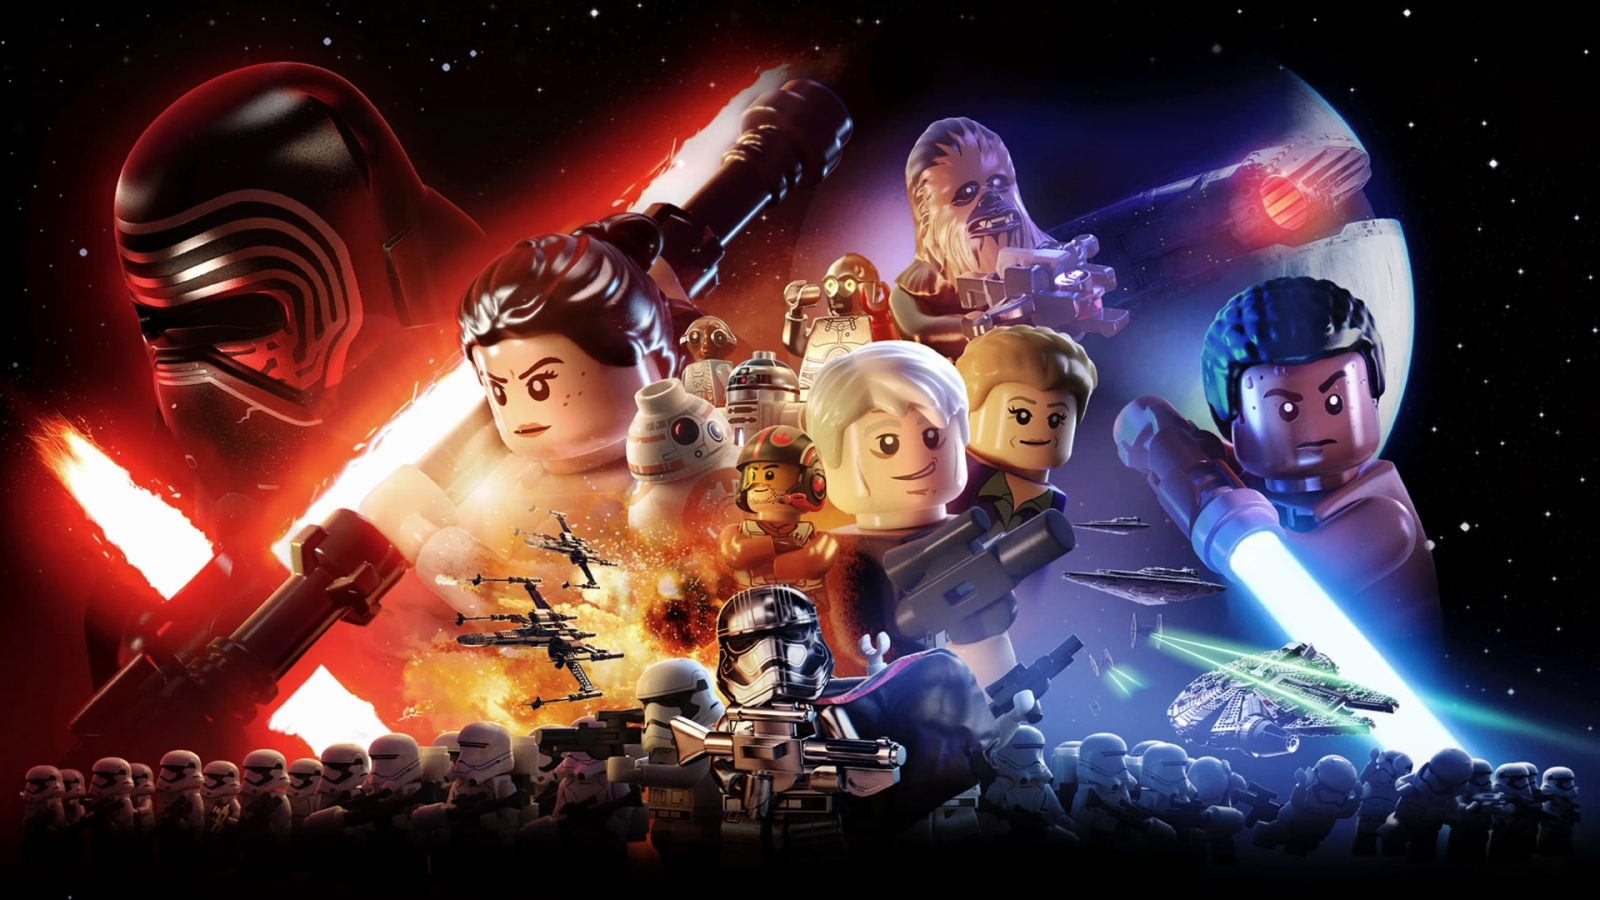 Lego Star Wars Force Awakens main